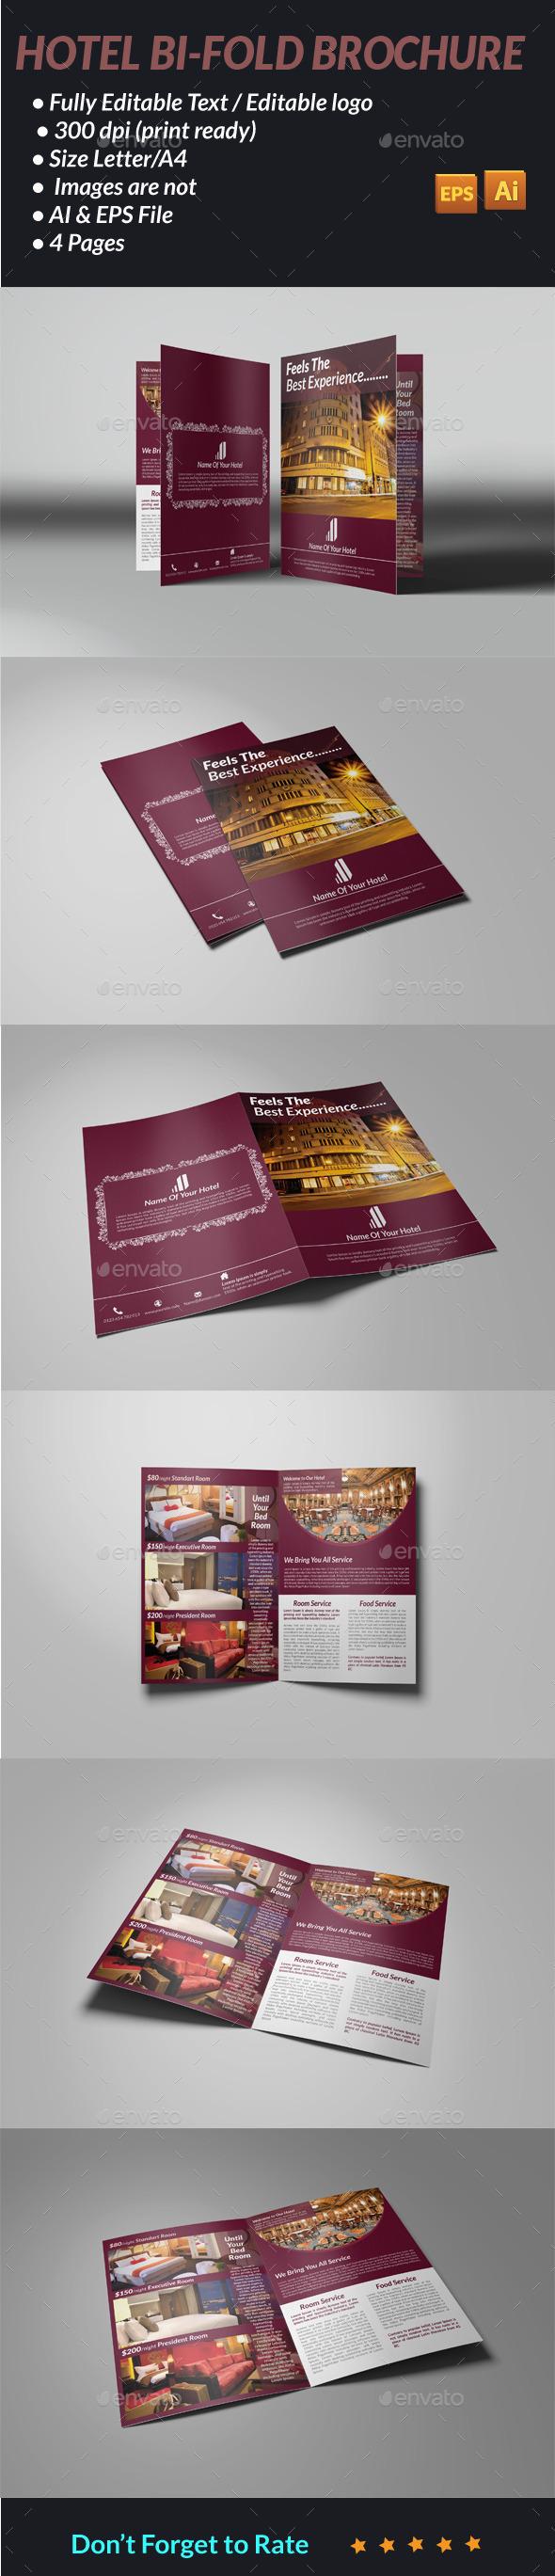 GraphicRiver Hotel Bi-Fold Brochure 11498245